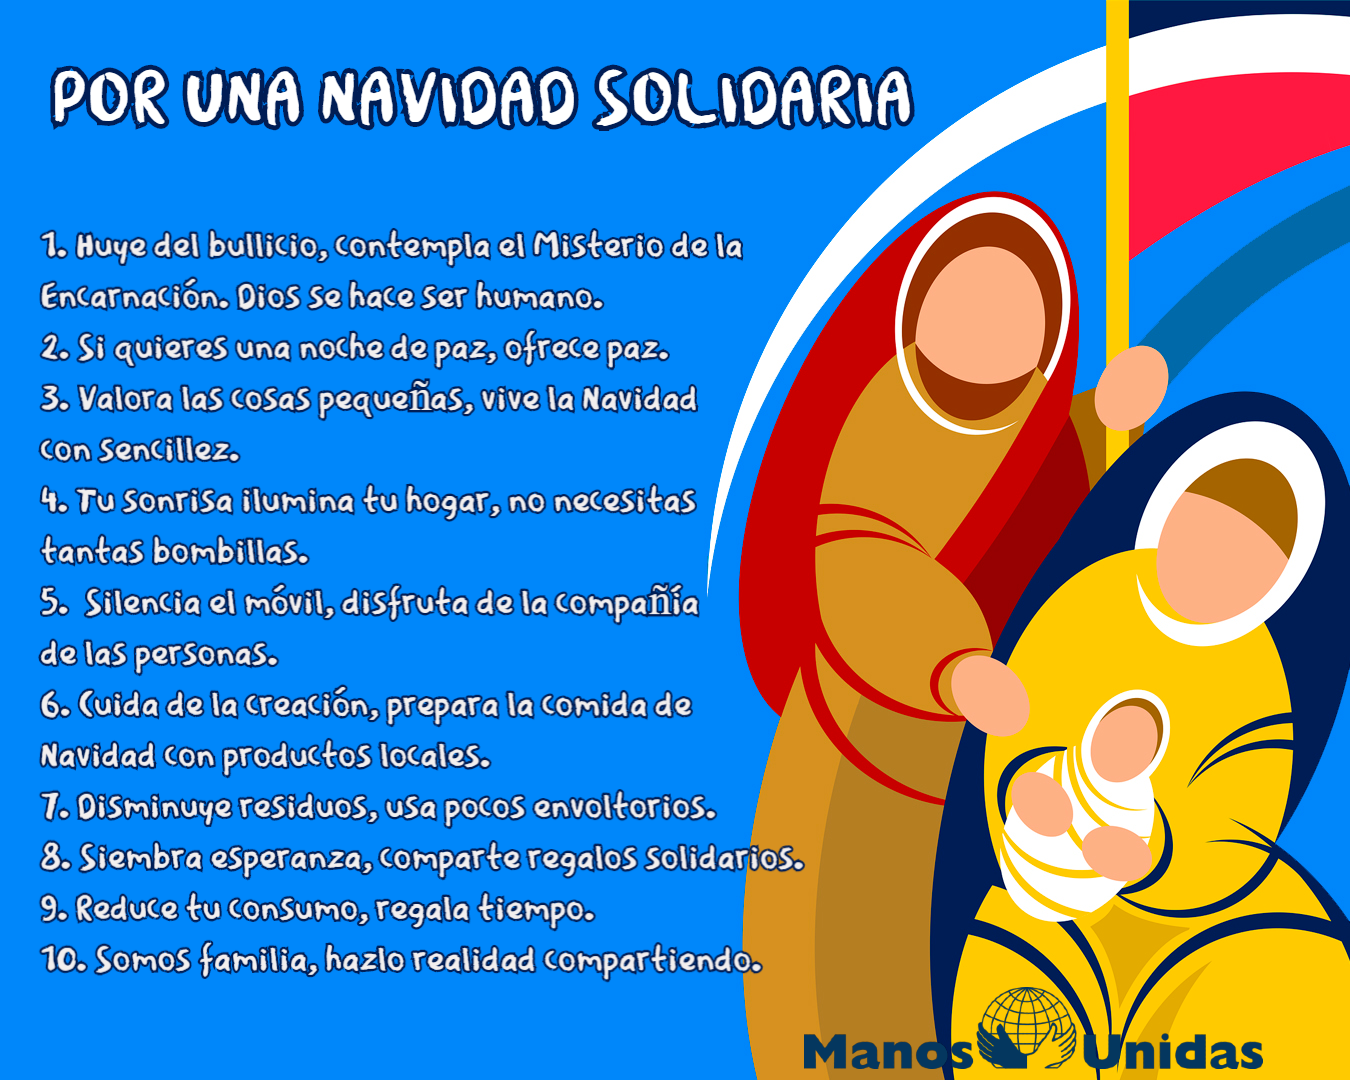 https://www.manosunidas.org/sites/default/files/navidad_solidaria_2019_ok.png